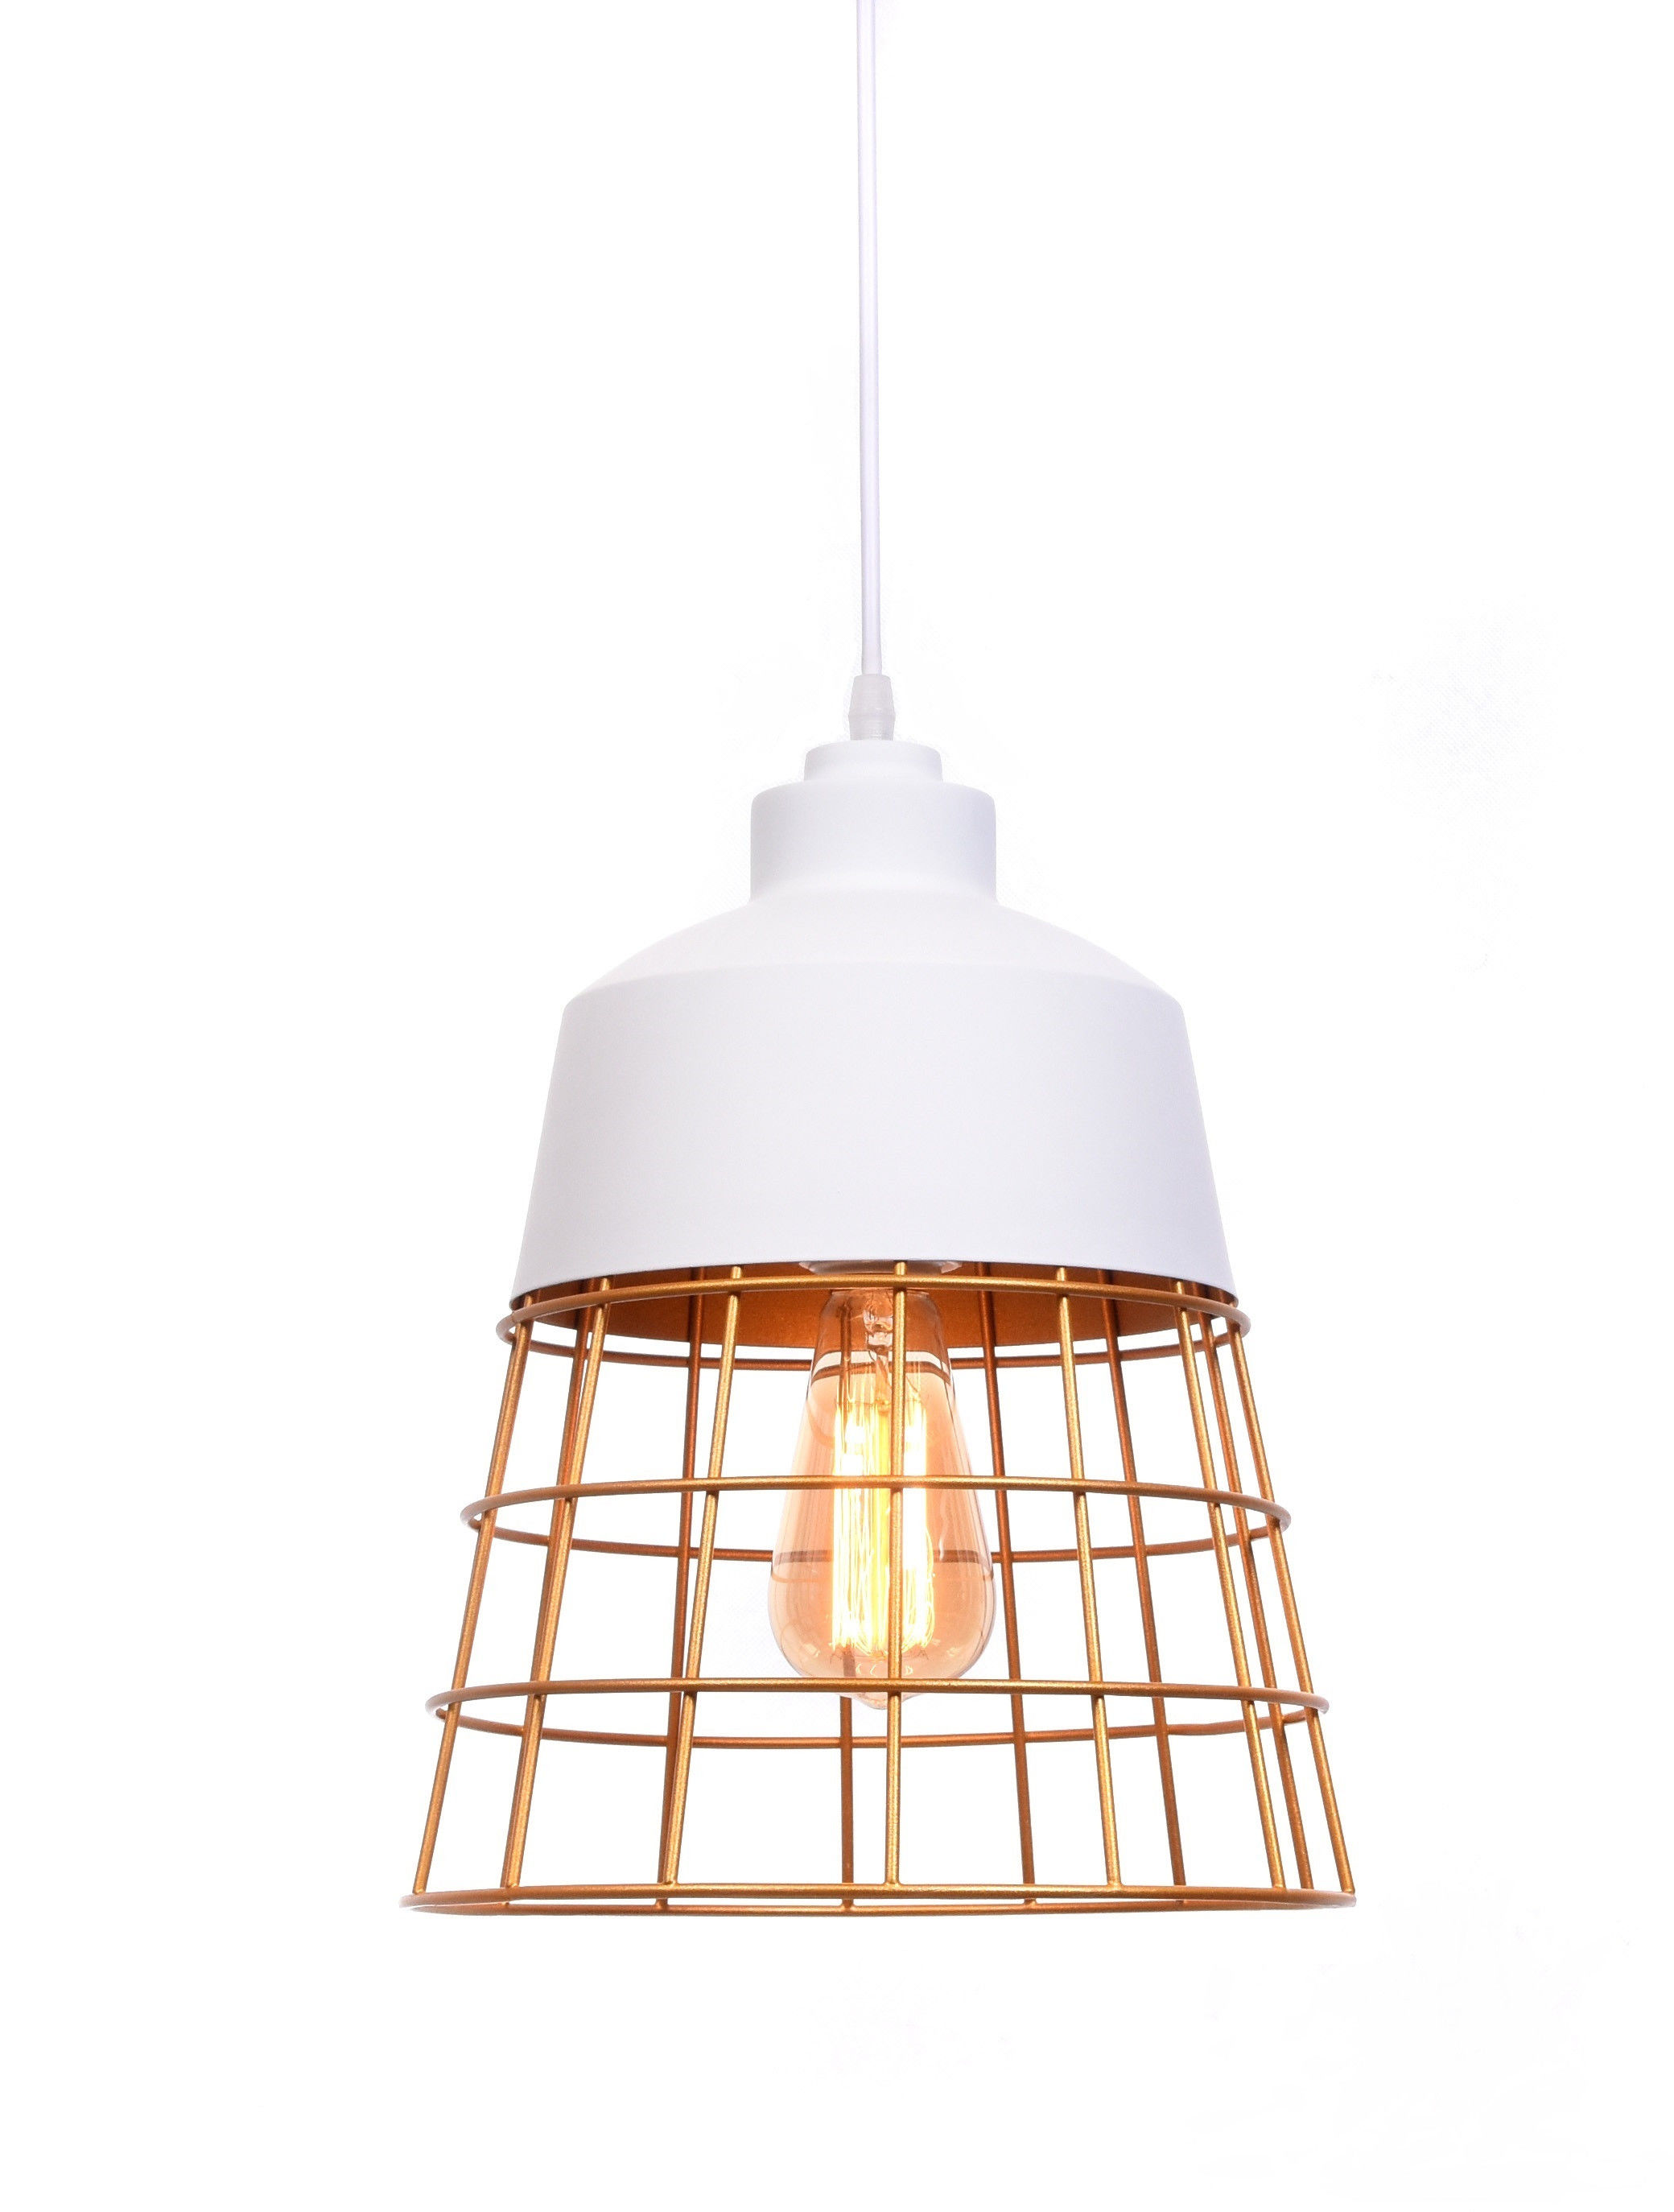 LAMPA WISZĄCA INDUSTRIALNA LOFT BIAŁA BAGSY